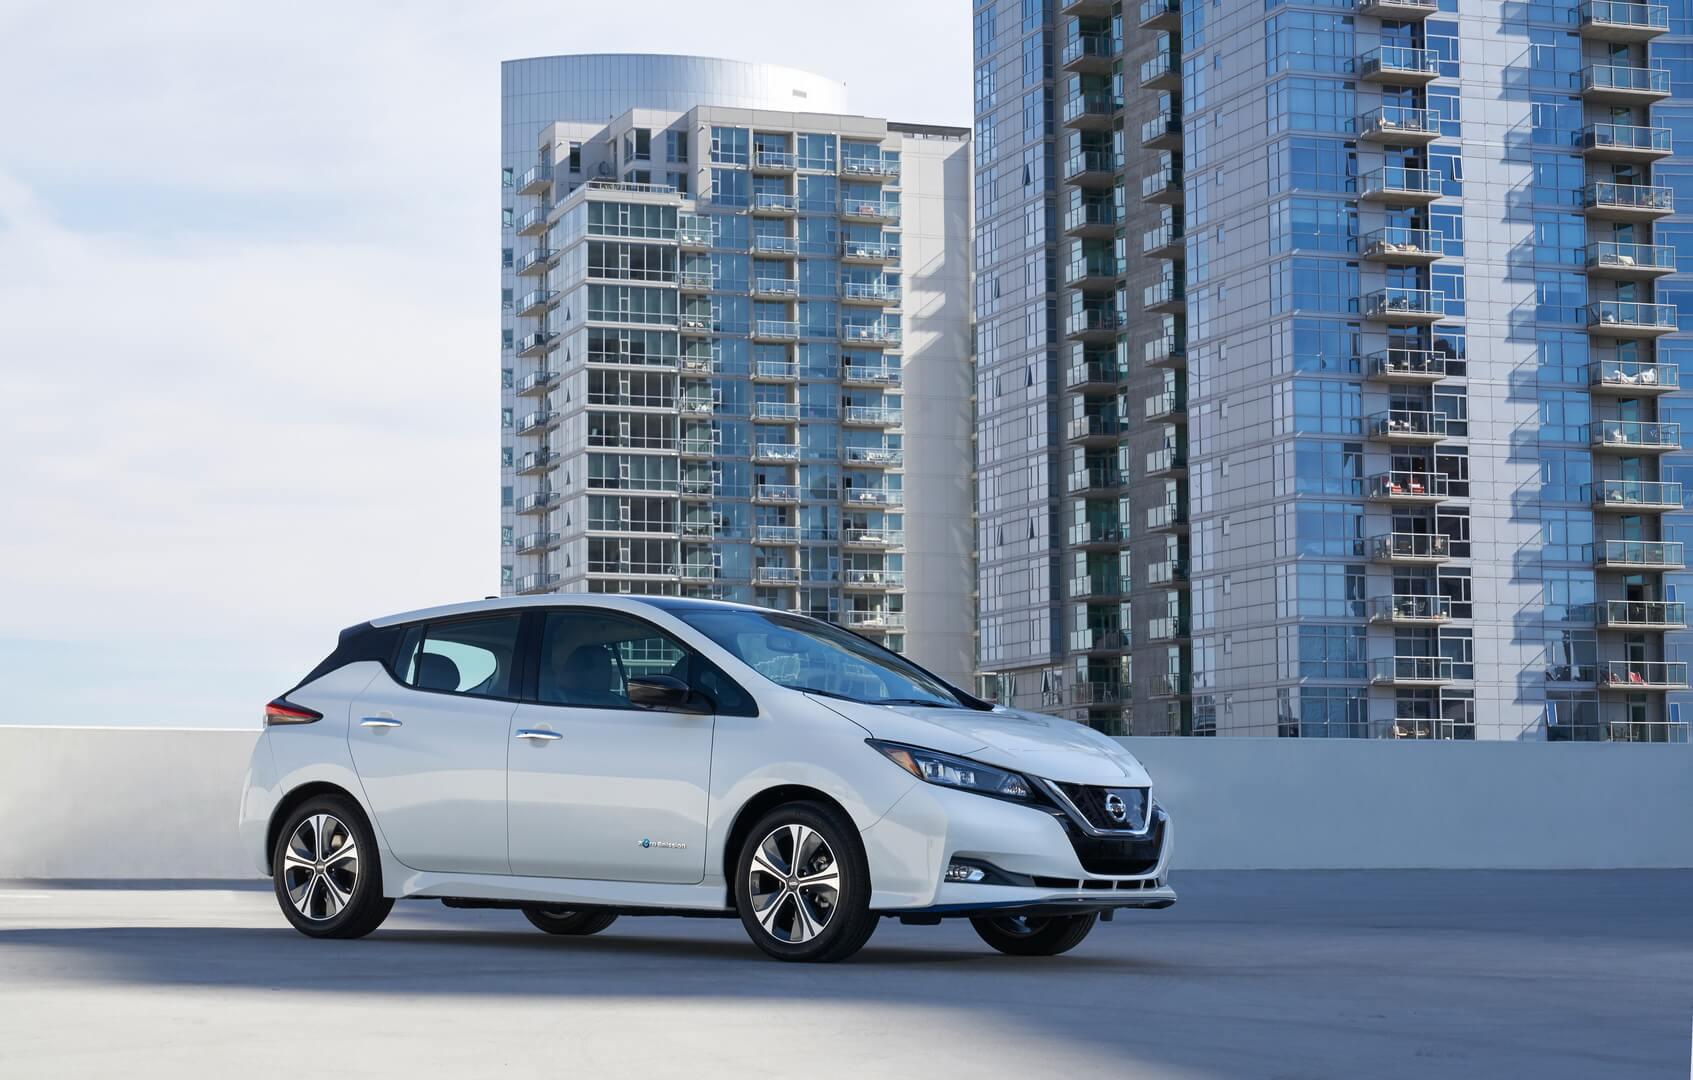 Электромобиль Nissan Leaf e+2019 с батареей 62кВт⋅ч